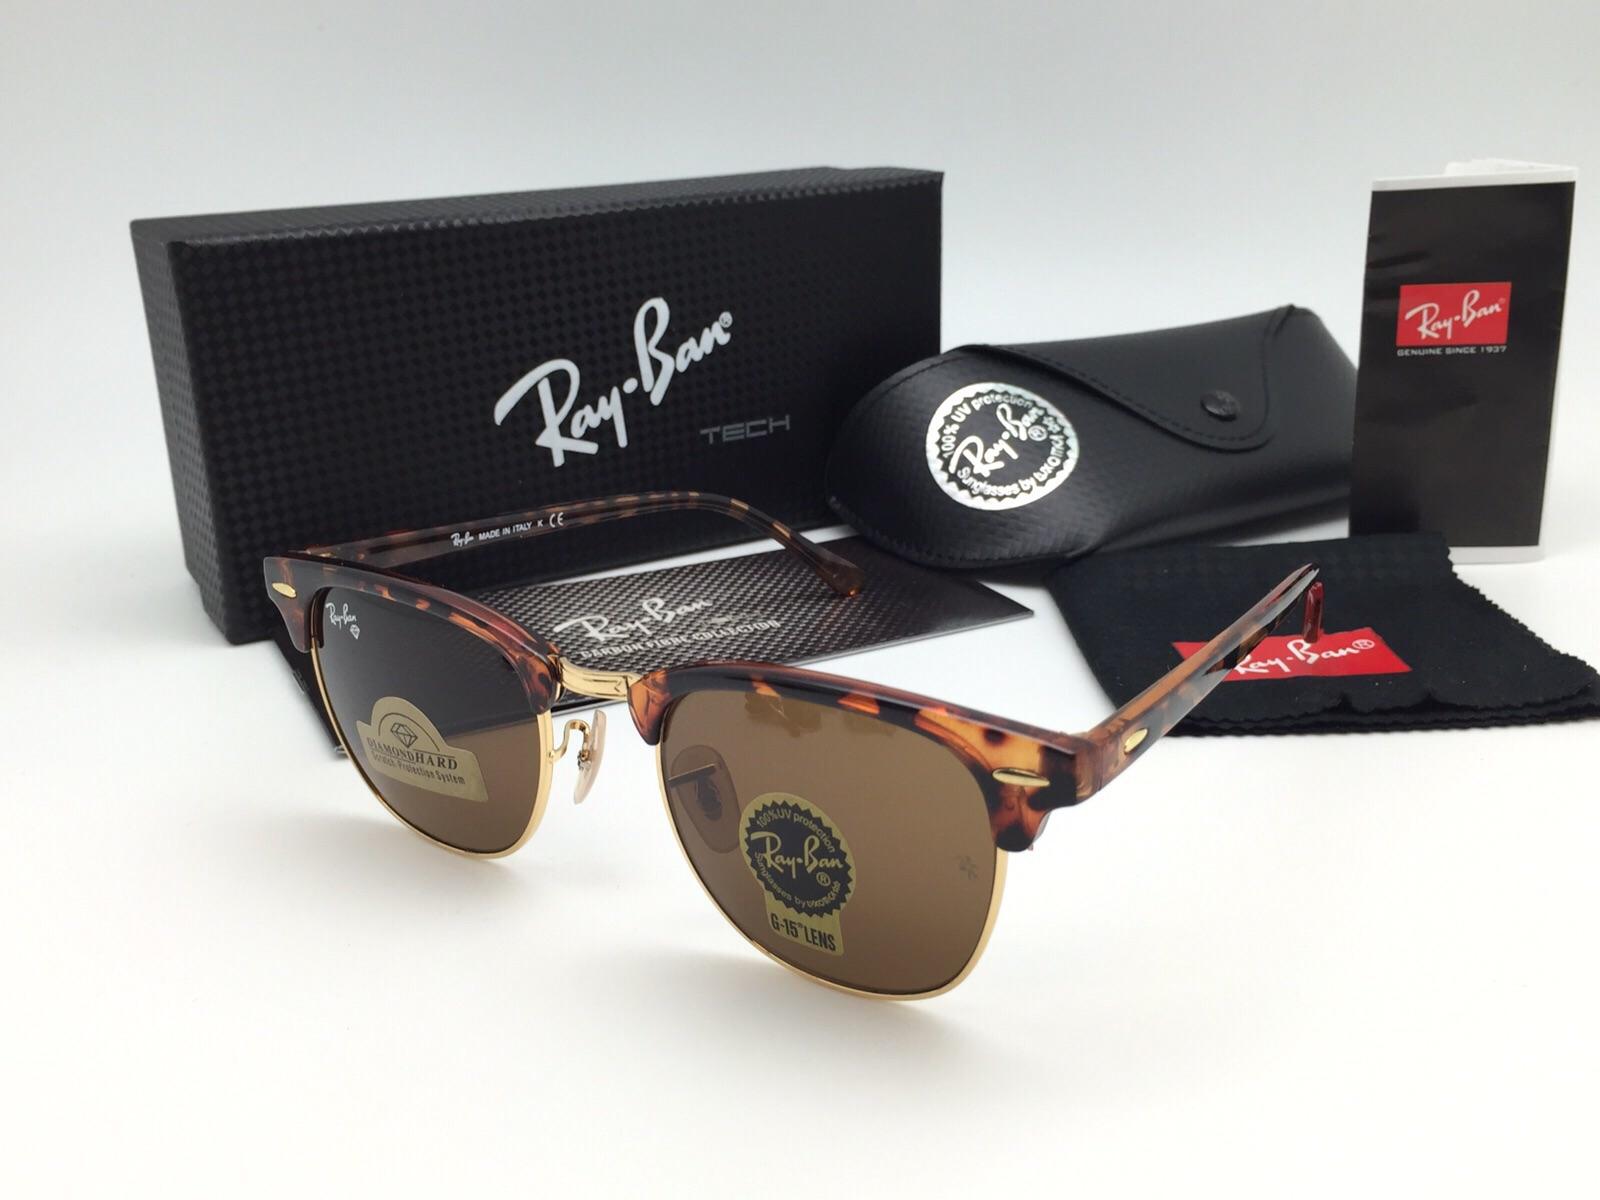 Kacamata Rayban Clubmaster Lensa Kaca Diamond Hard Motif